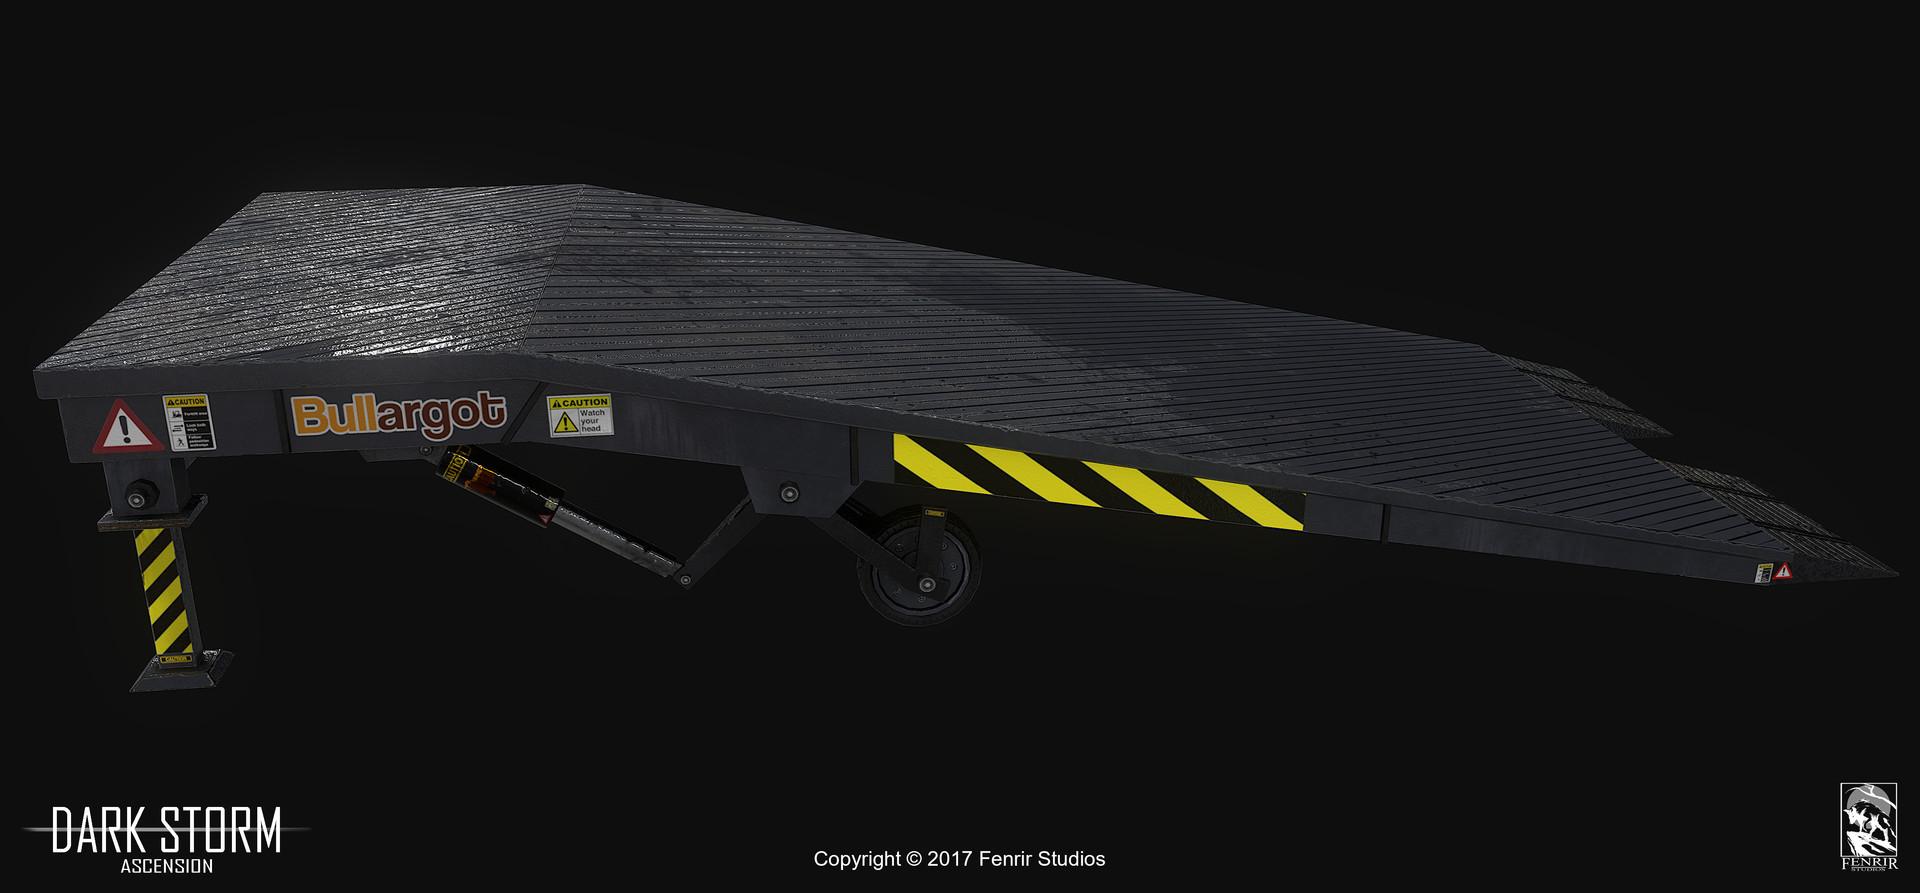 Nikolaos kaltsogiannis cargo ramp presentation 05